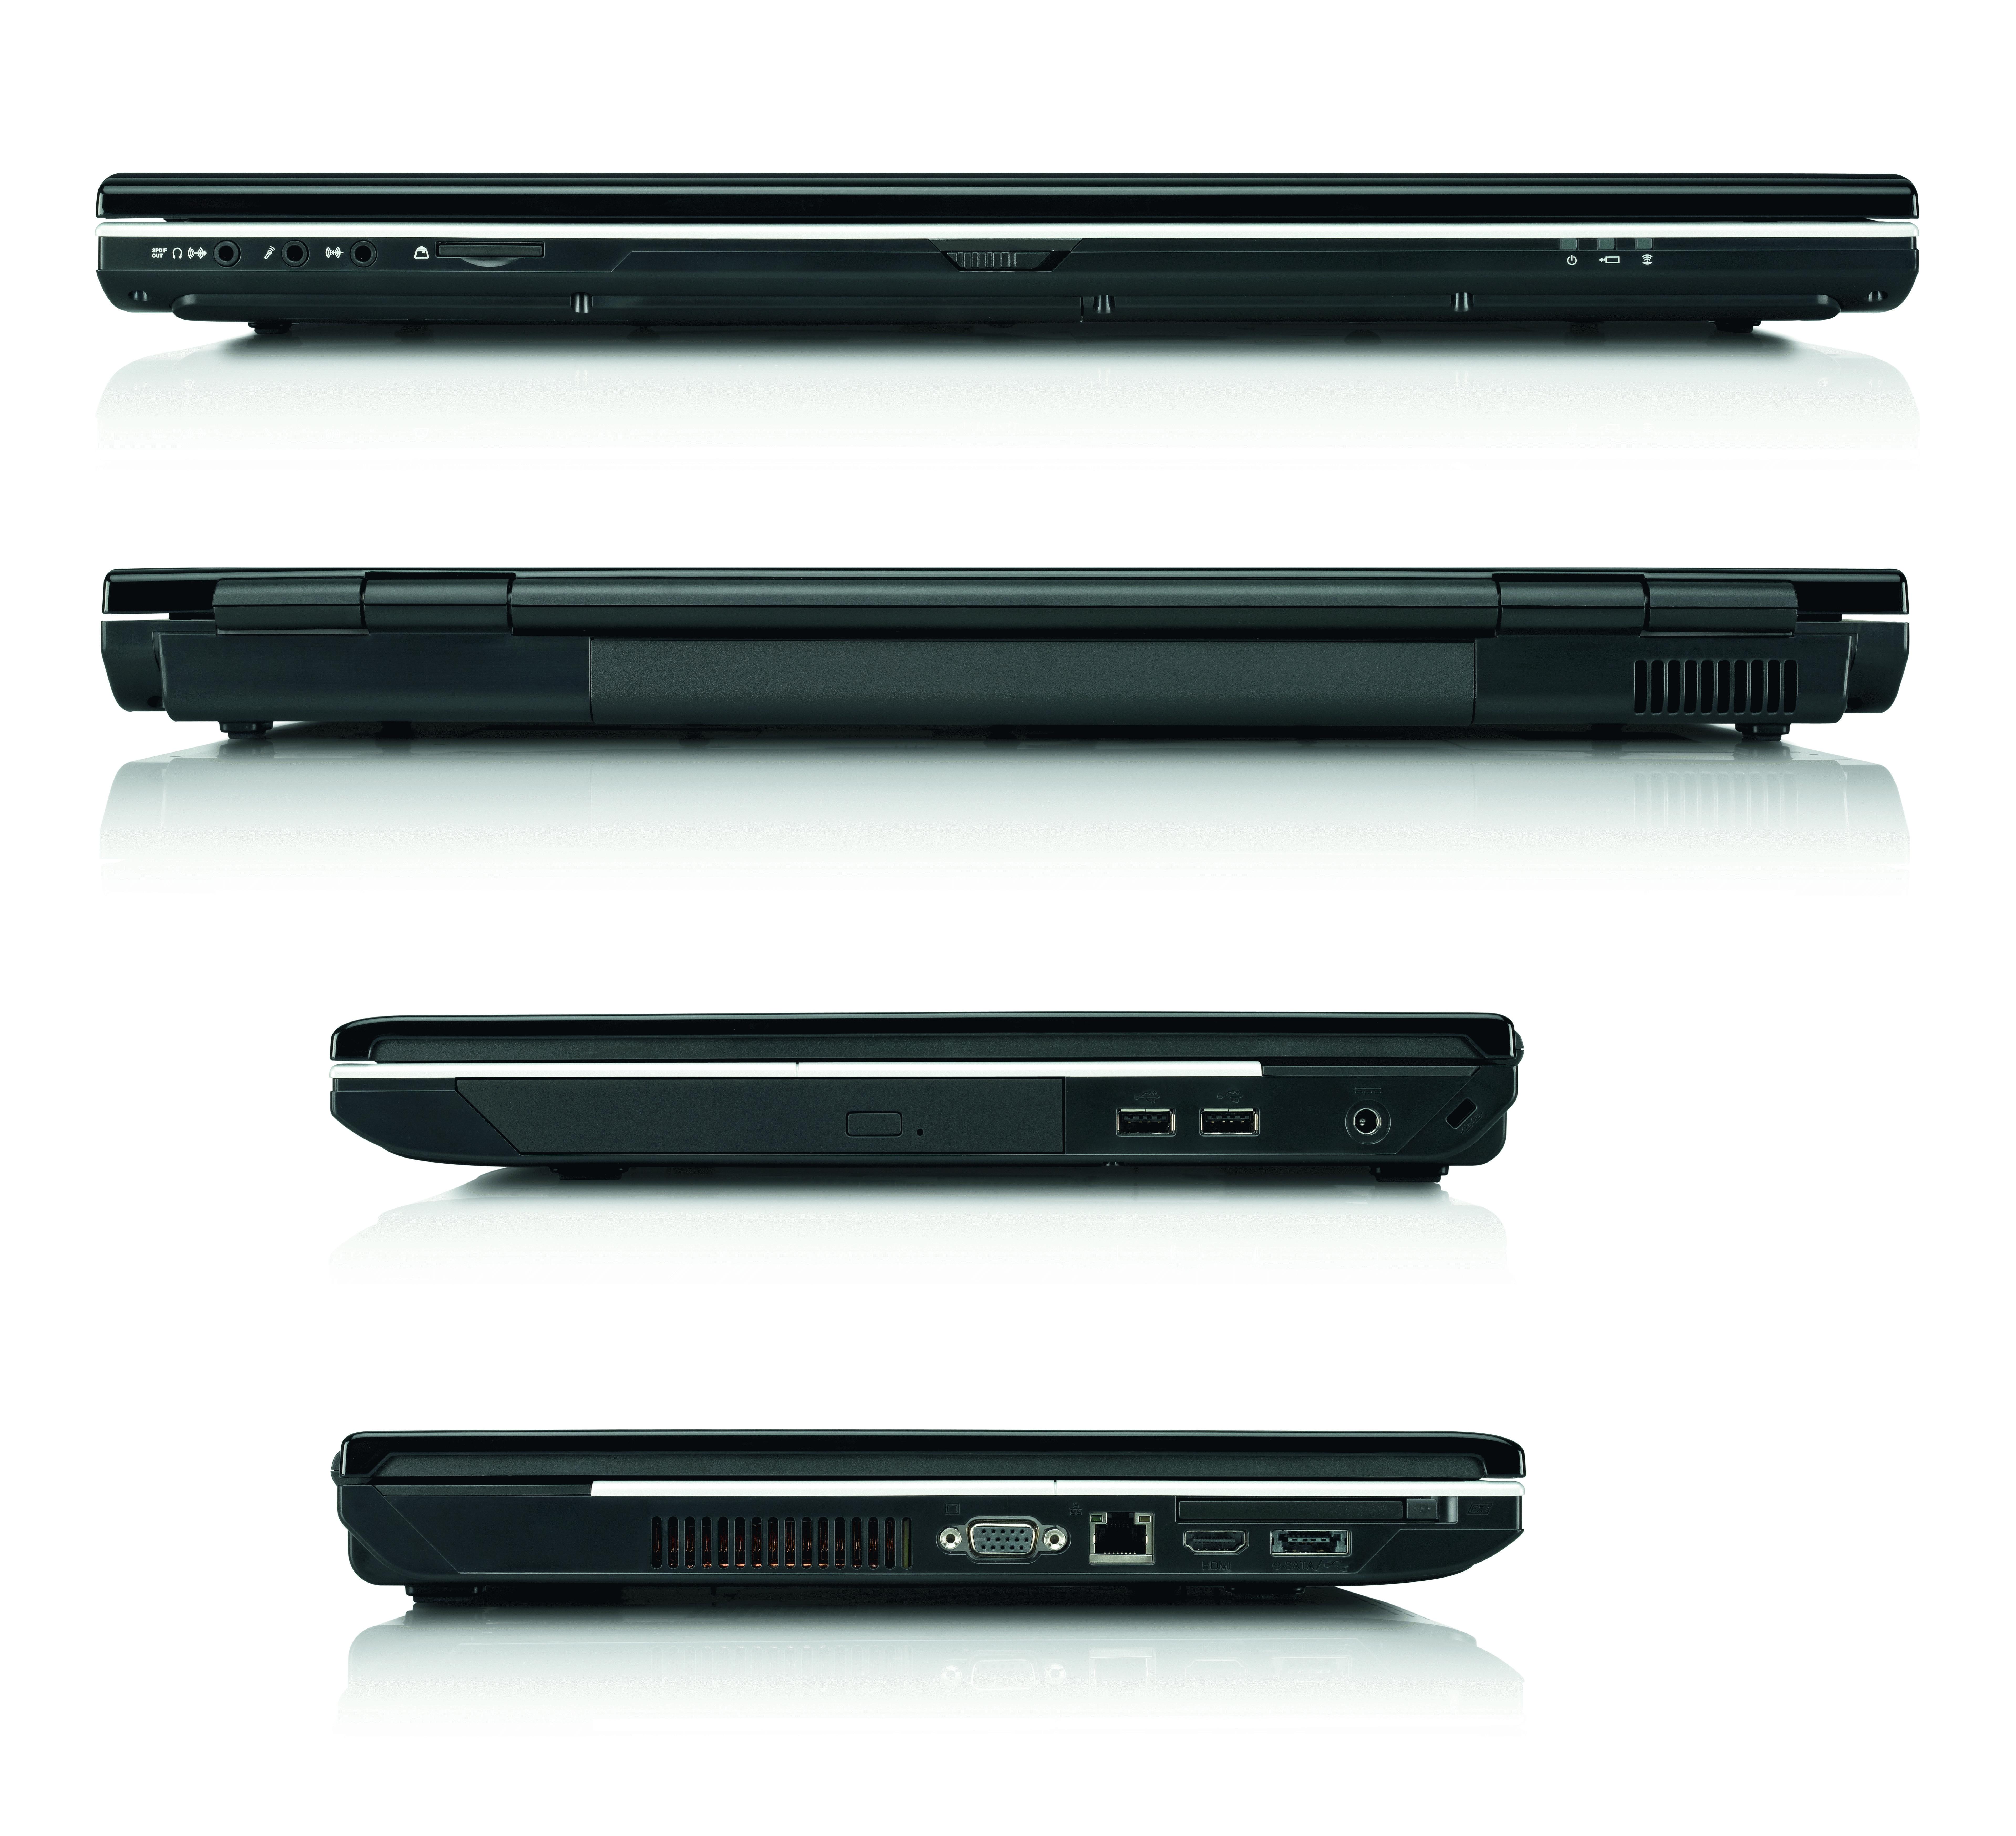 "Fujitsu AMILO Pi 3660 2.2GHz T6600 18.4"" 1680 x 945Pixel"